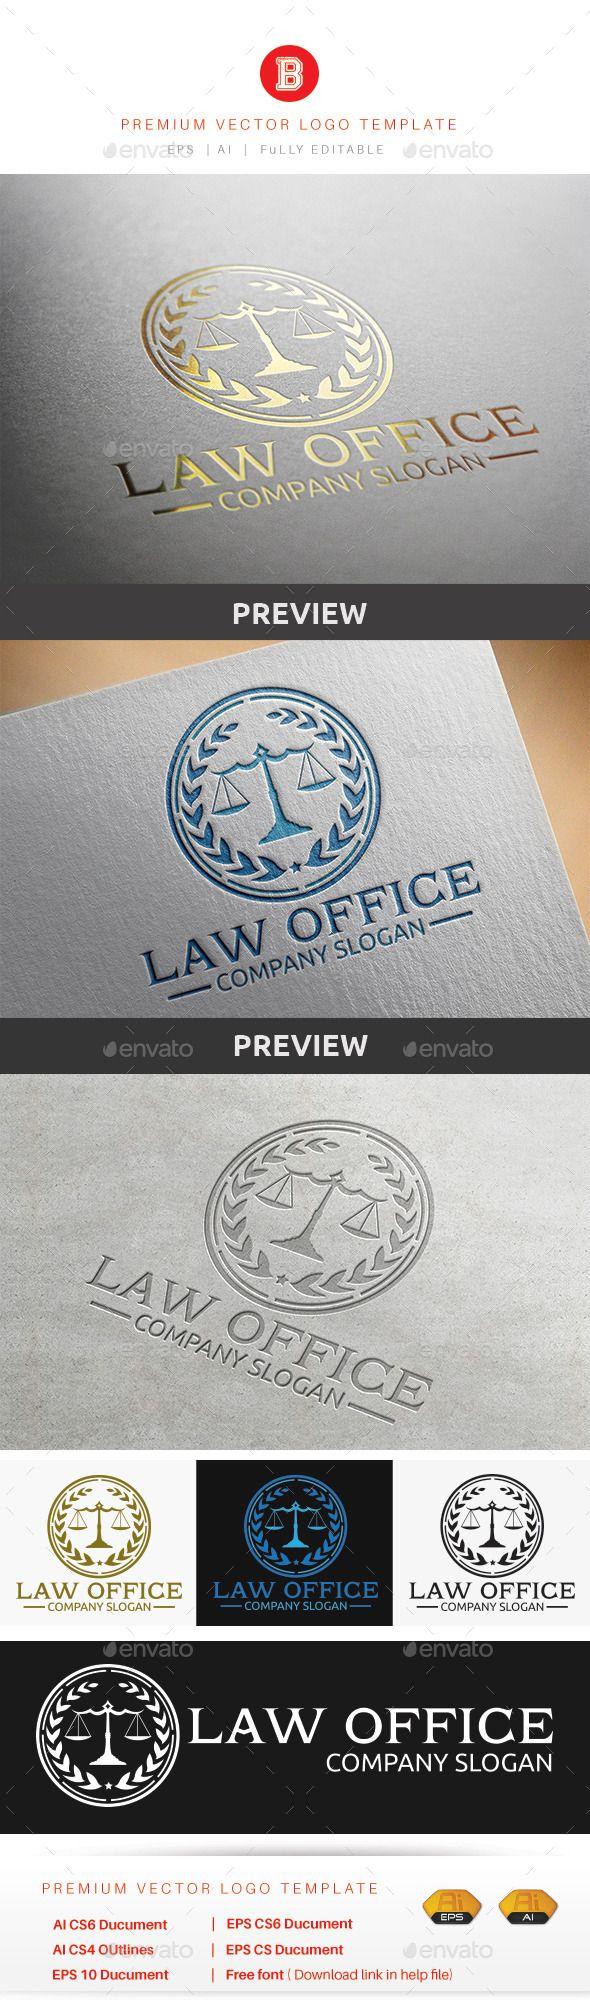 Microsoft Office Logo Design Delectable Inspiration